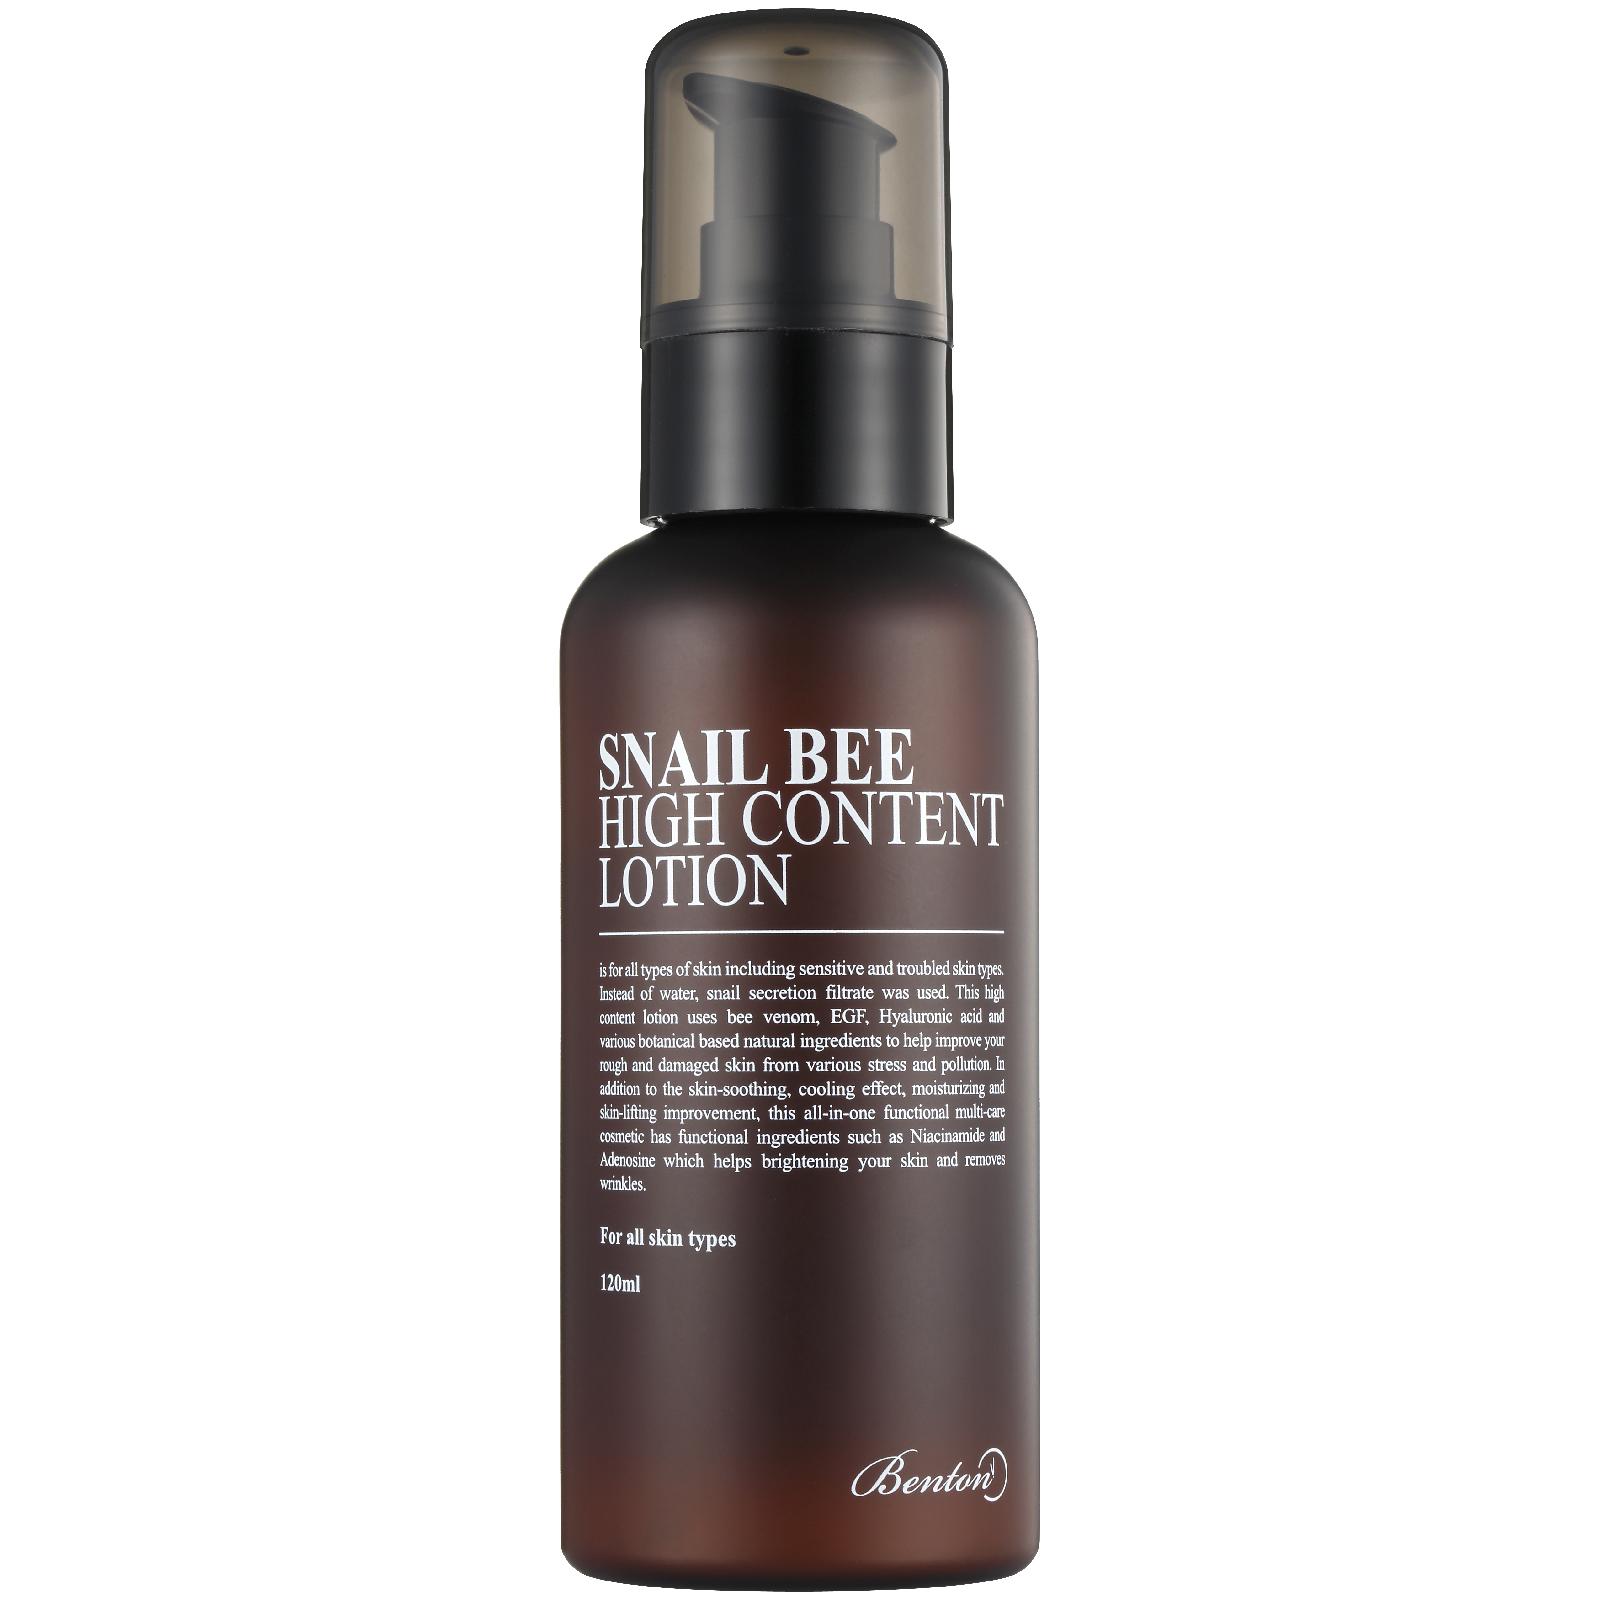 Benton Snail Bee High Content Lotion 120ml | Free Shipping | Lookfantastic